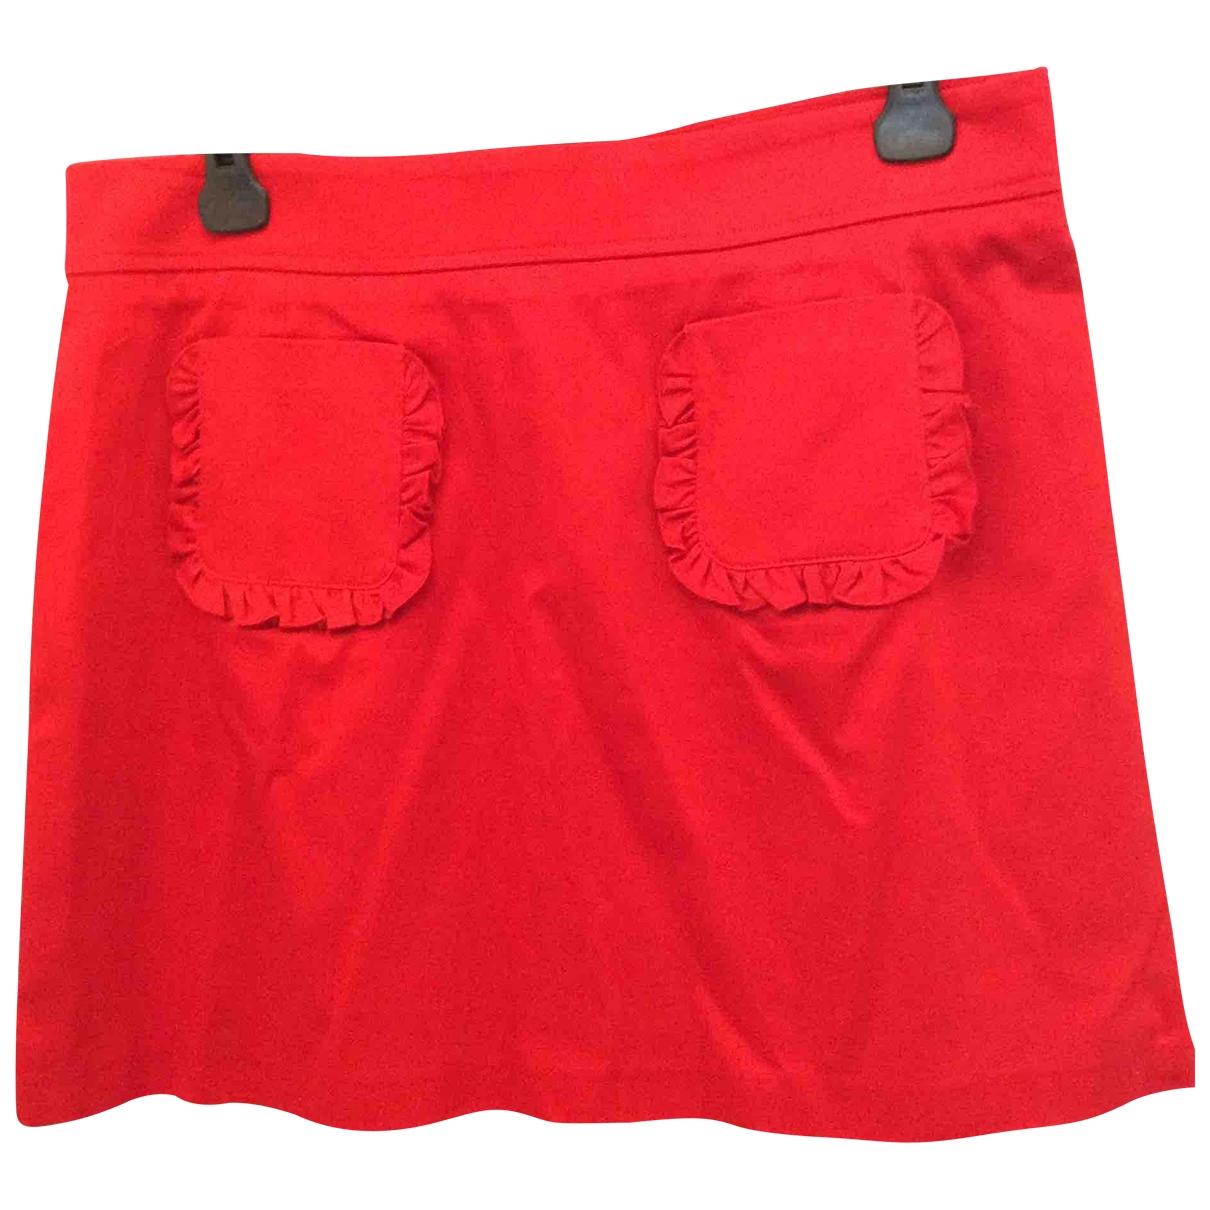 Tara Jarmon \N Red Cotton - elasthane skirt for Women 44 FR